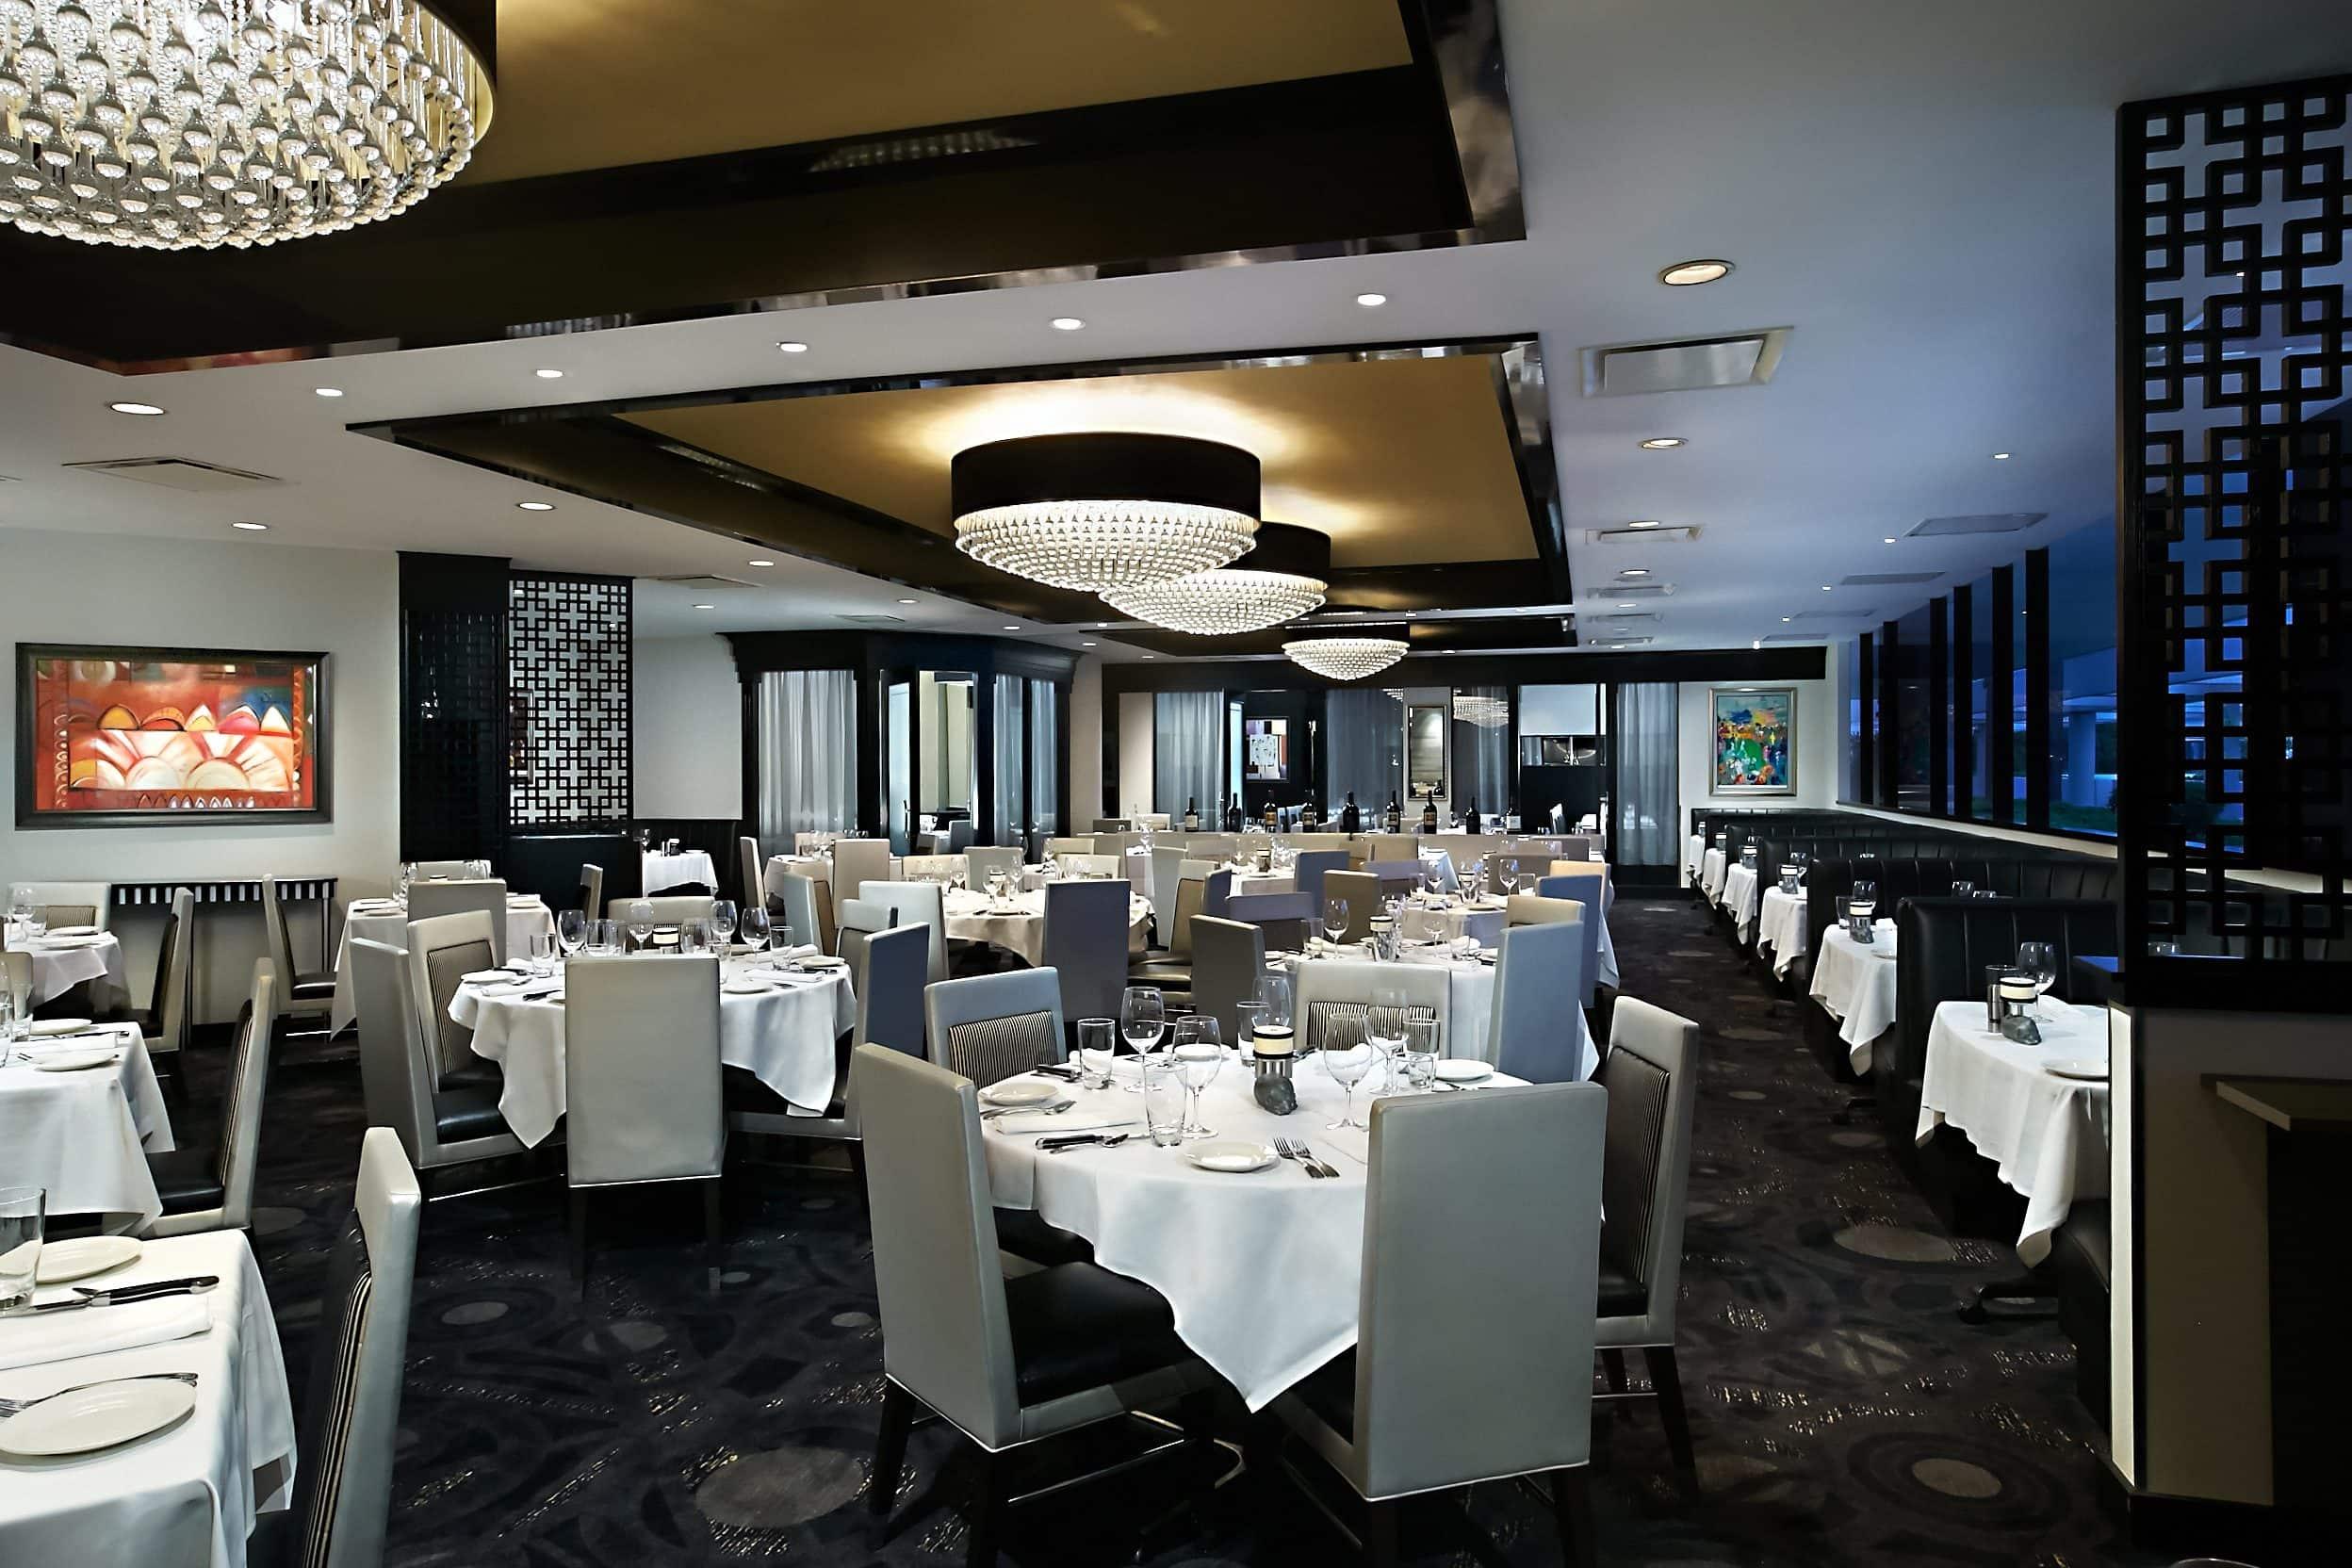 Beau Mortonu0027s The Steakhouse : Cuisine Américaine à Proximité De Marina Bay    Mandarin Oriental, Singapore